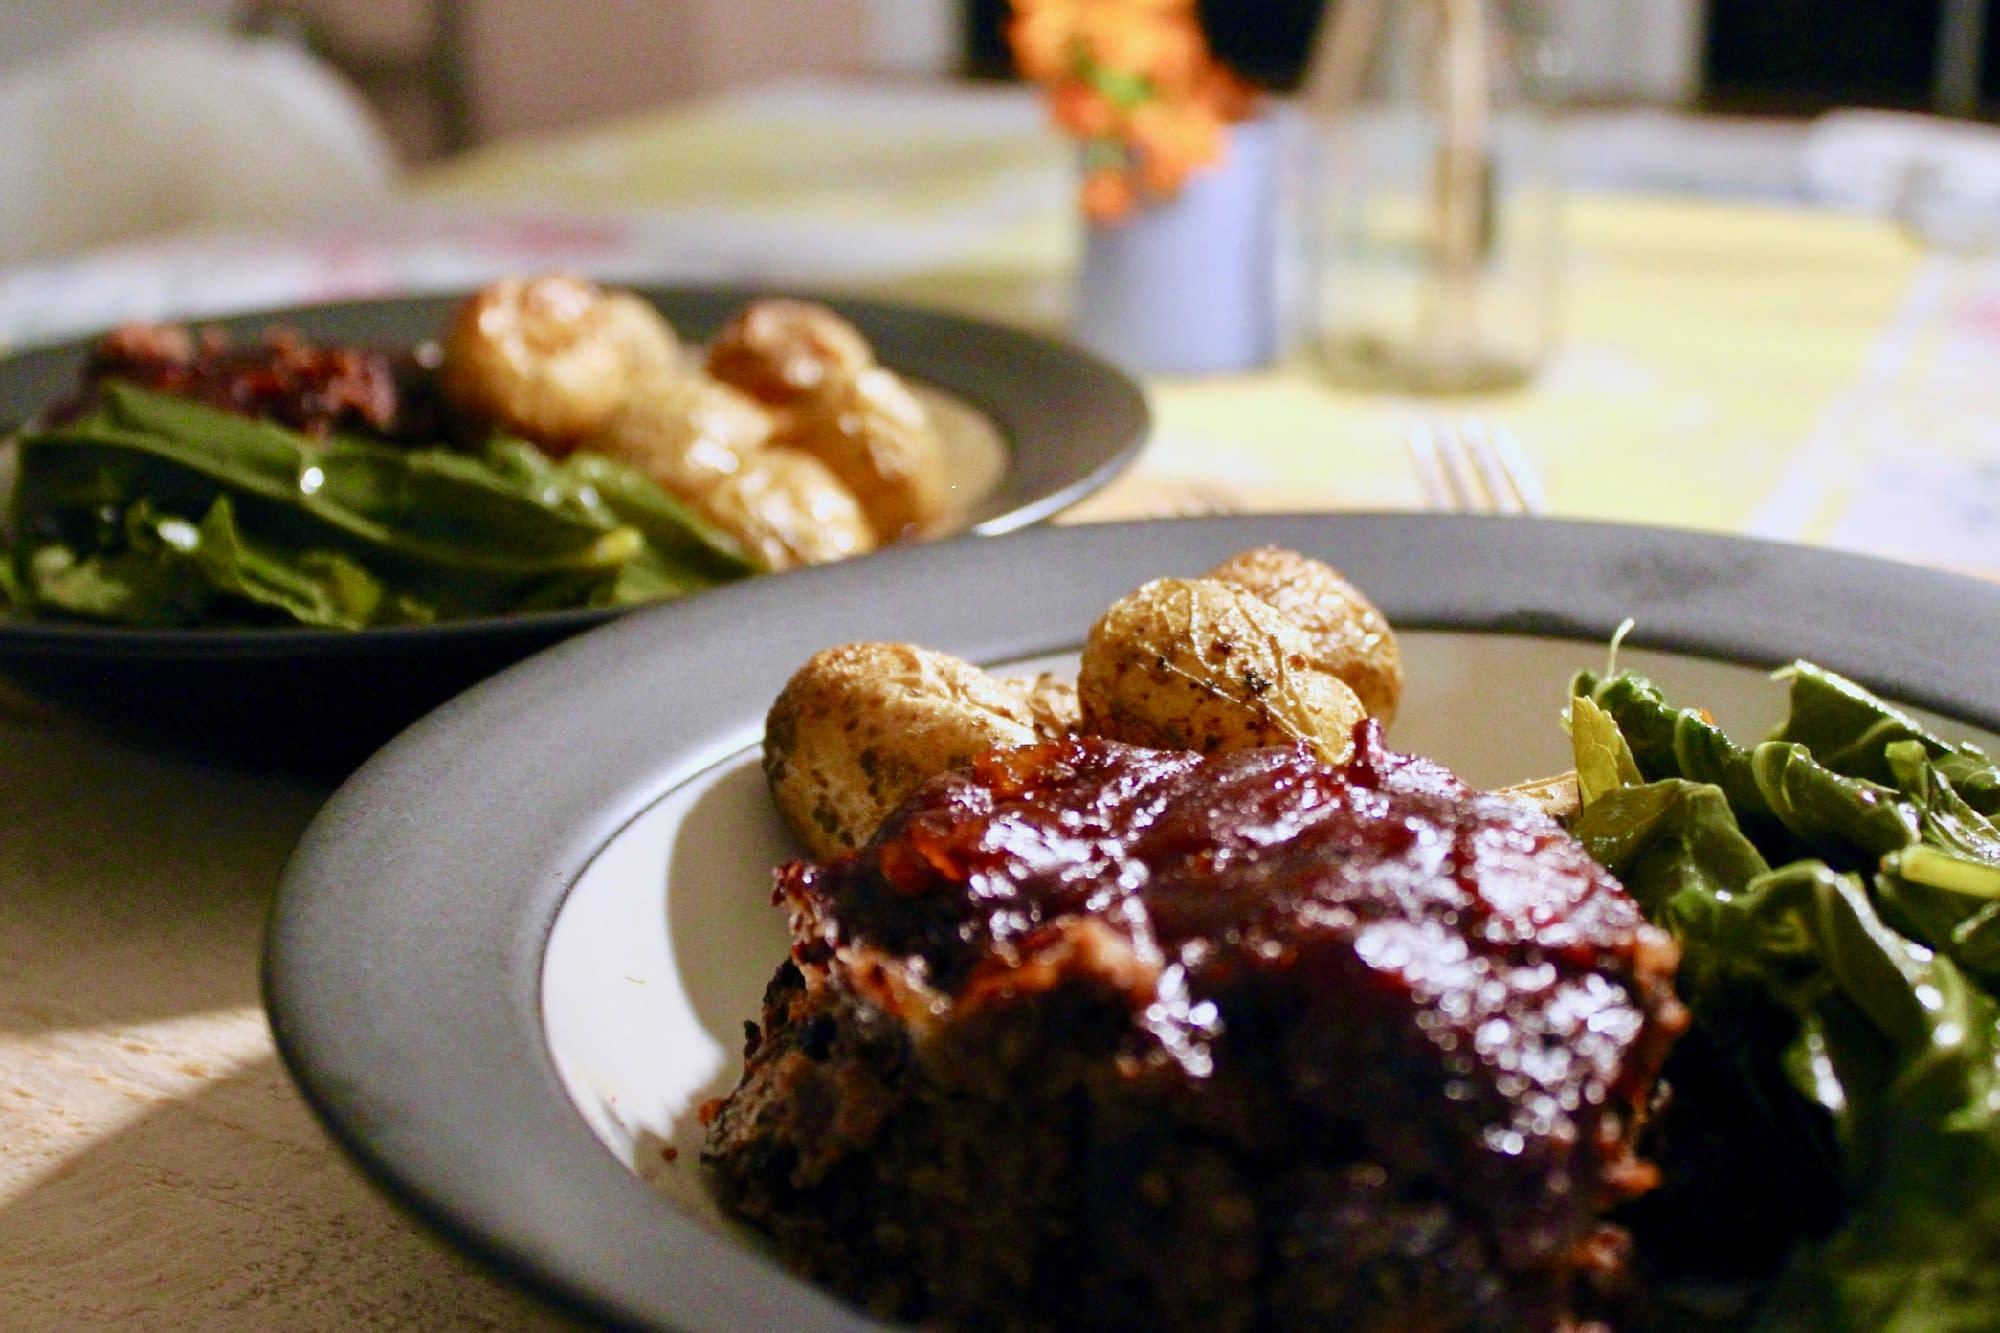 Tender vegan meatloaf from Savor + Harvest with Karl served at the table.